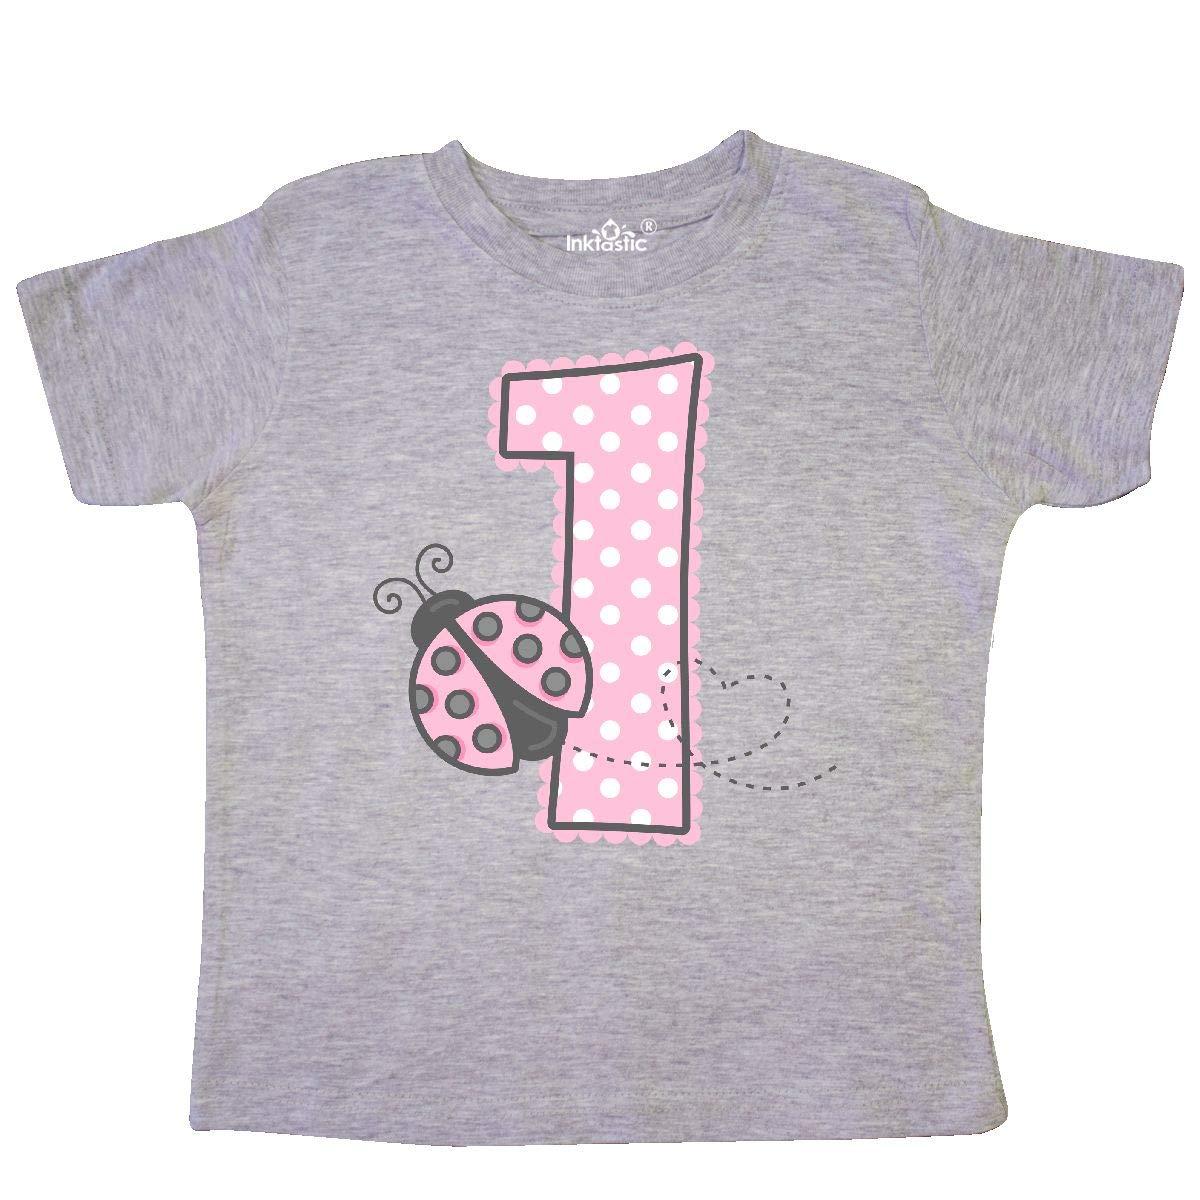 inktastic Pink Ladybug 1st Birthday Toddler T-Shirt